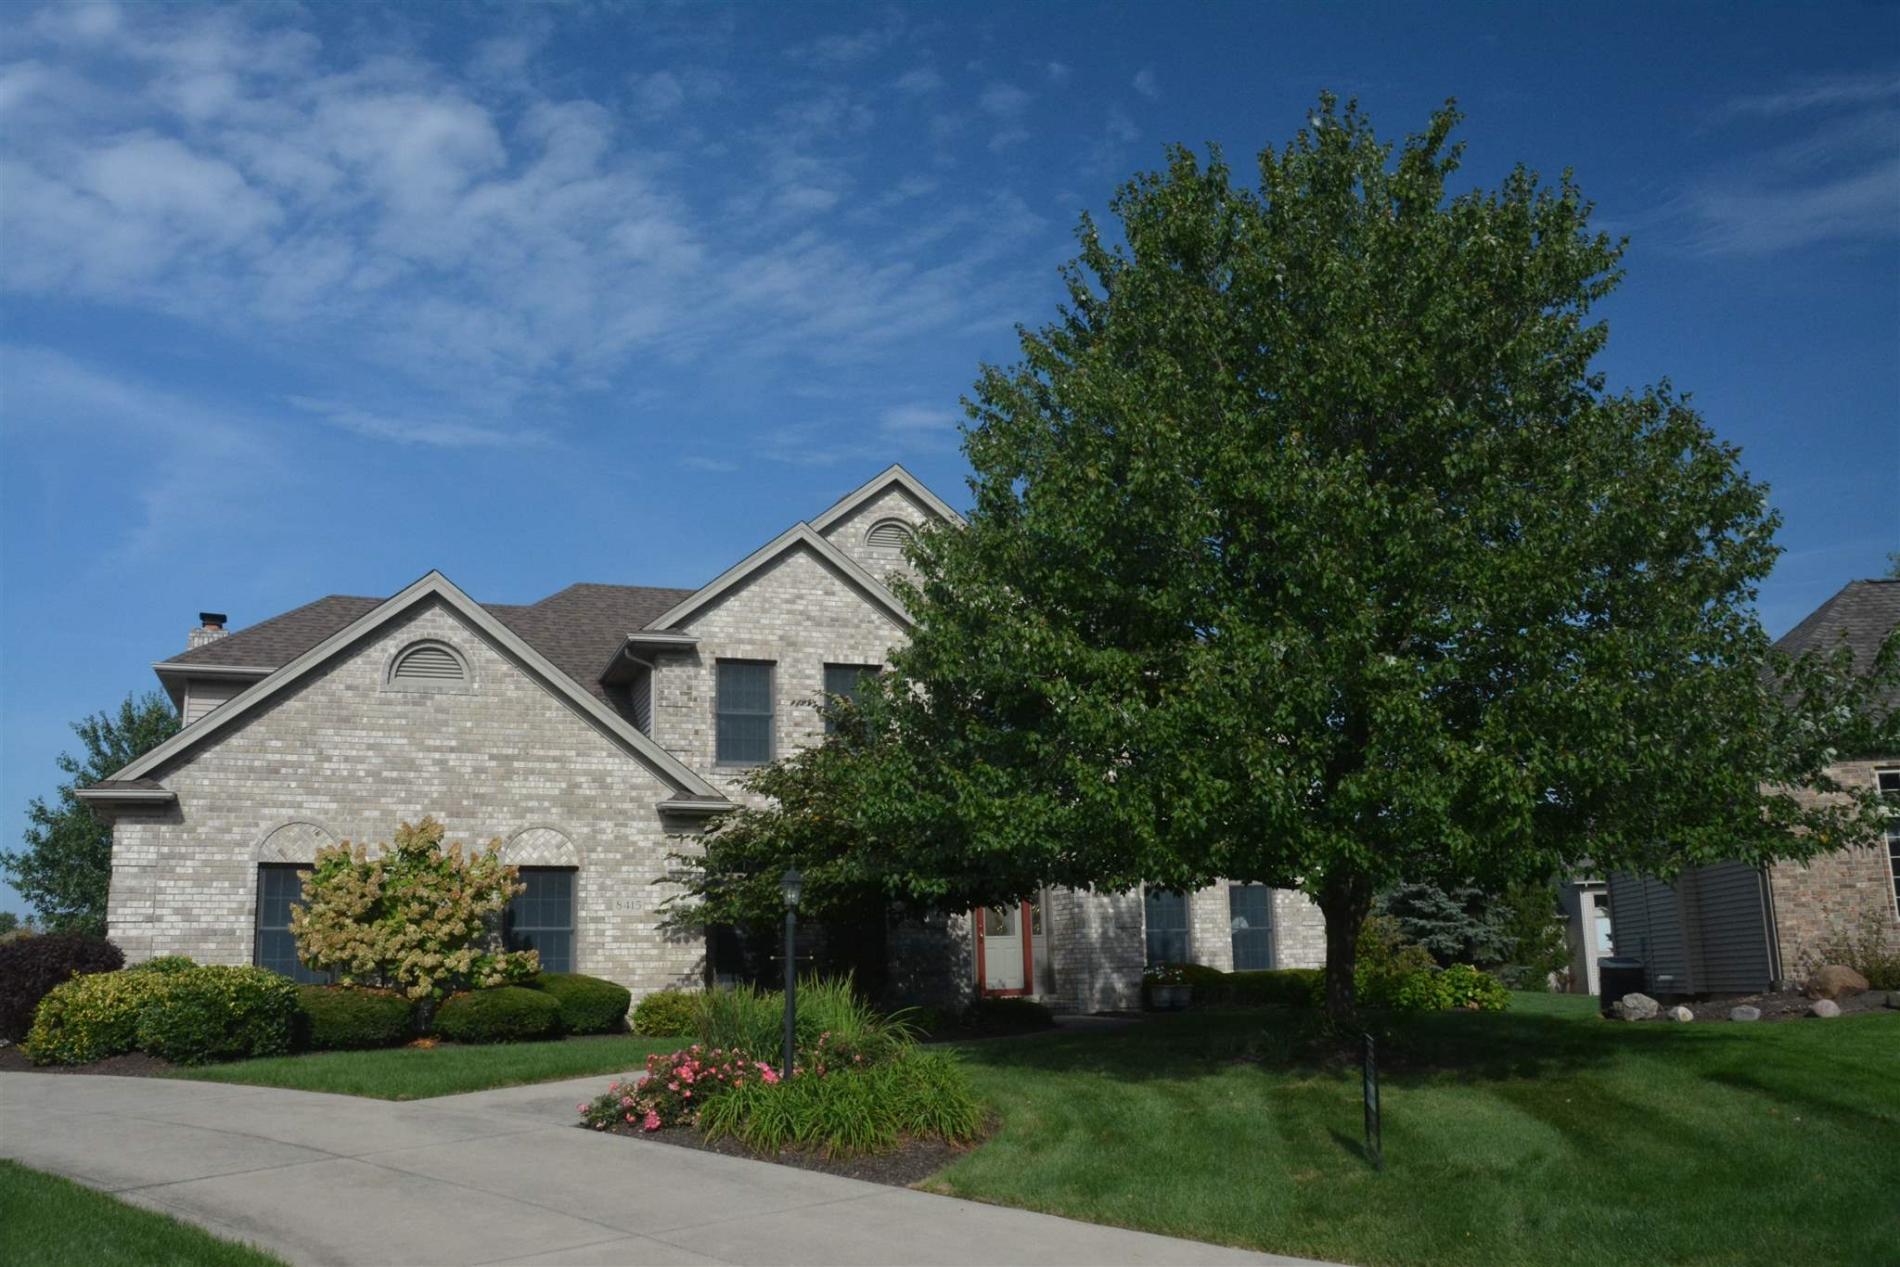 8415 Cinnabar Ct., Fort Wayne